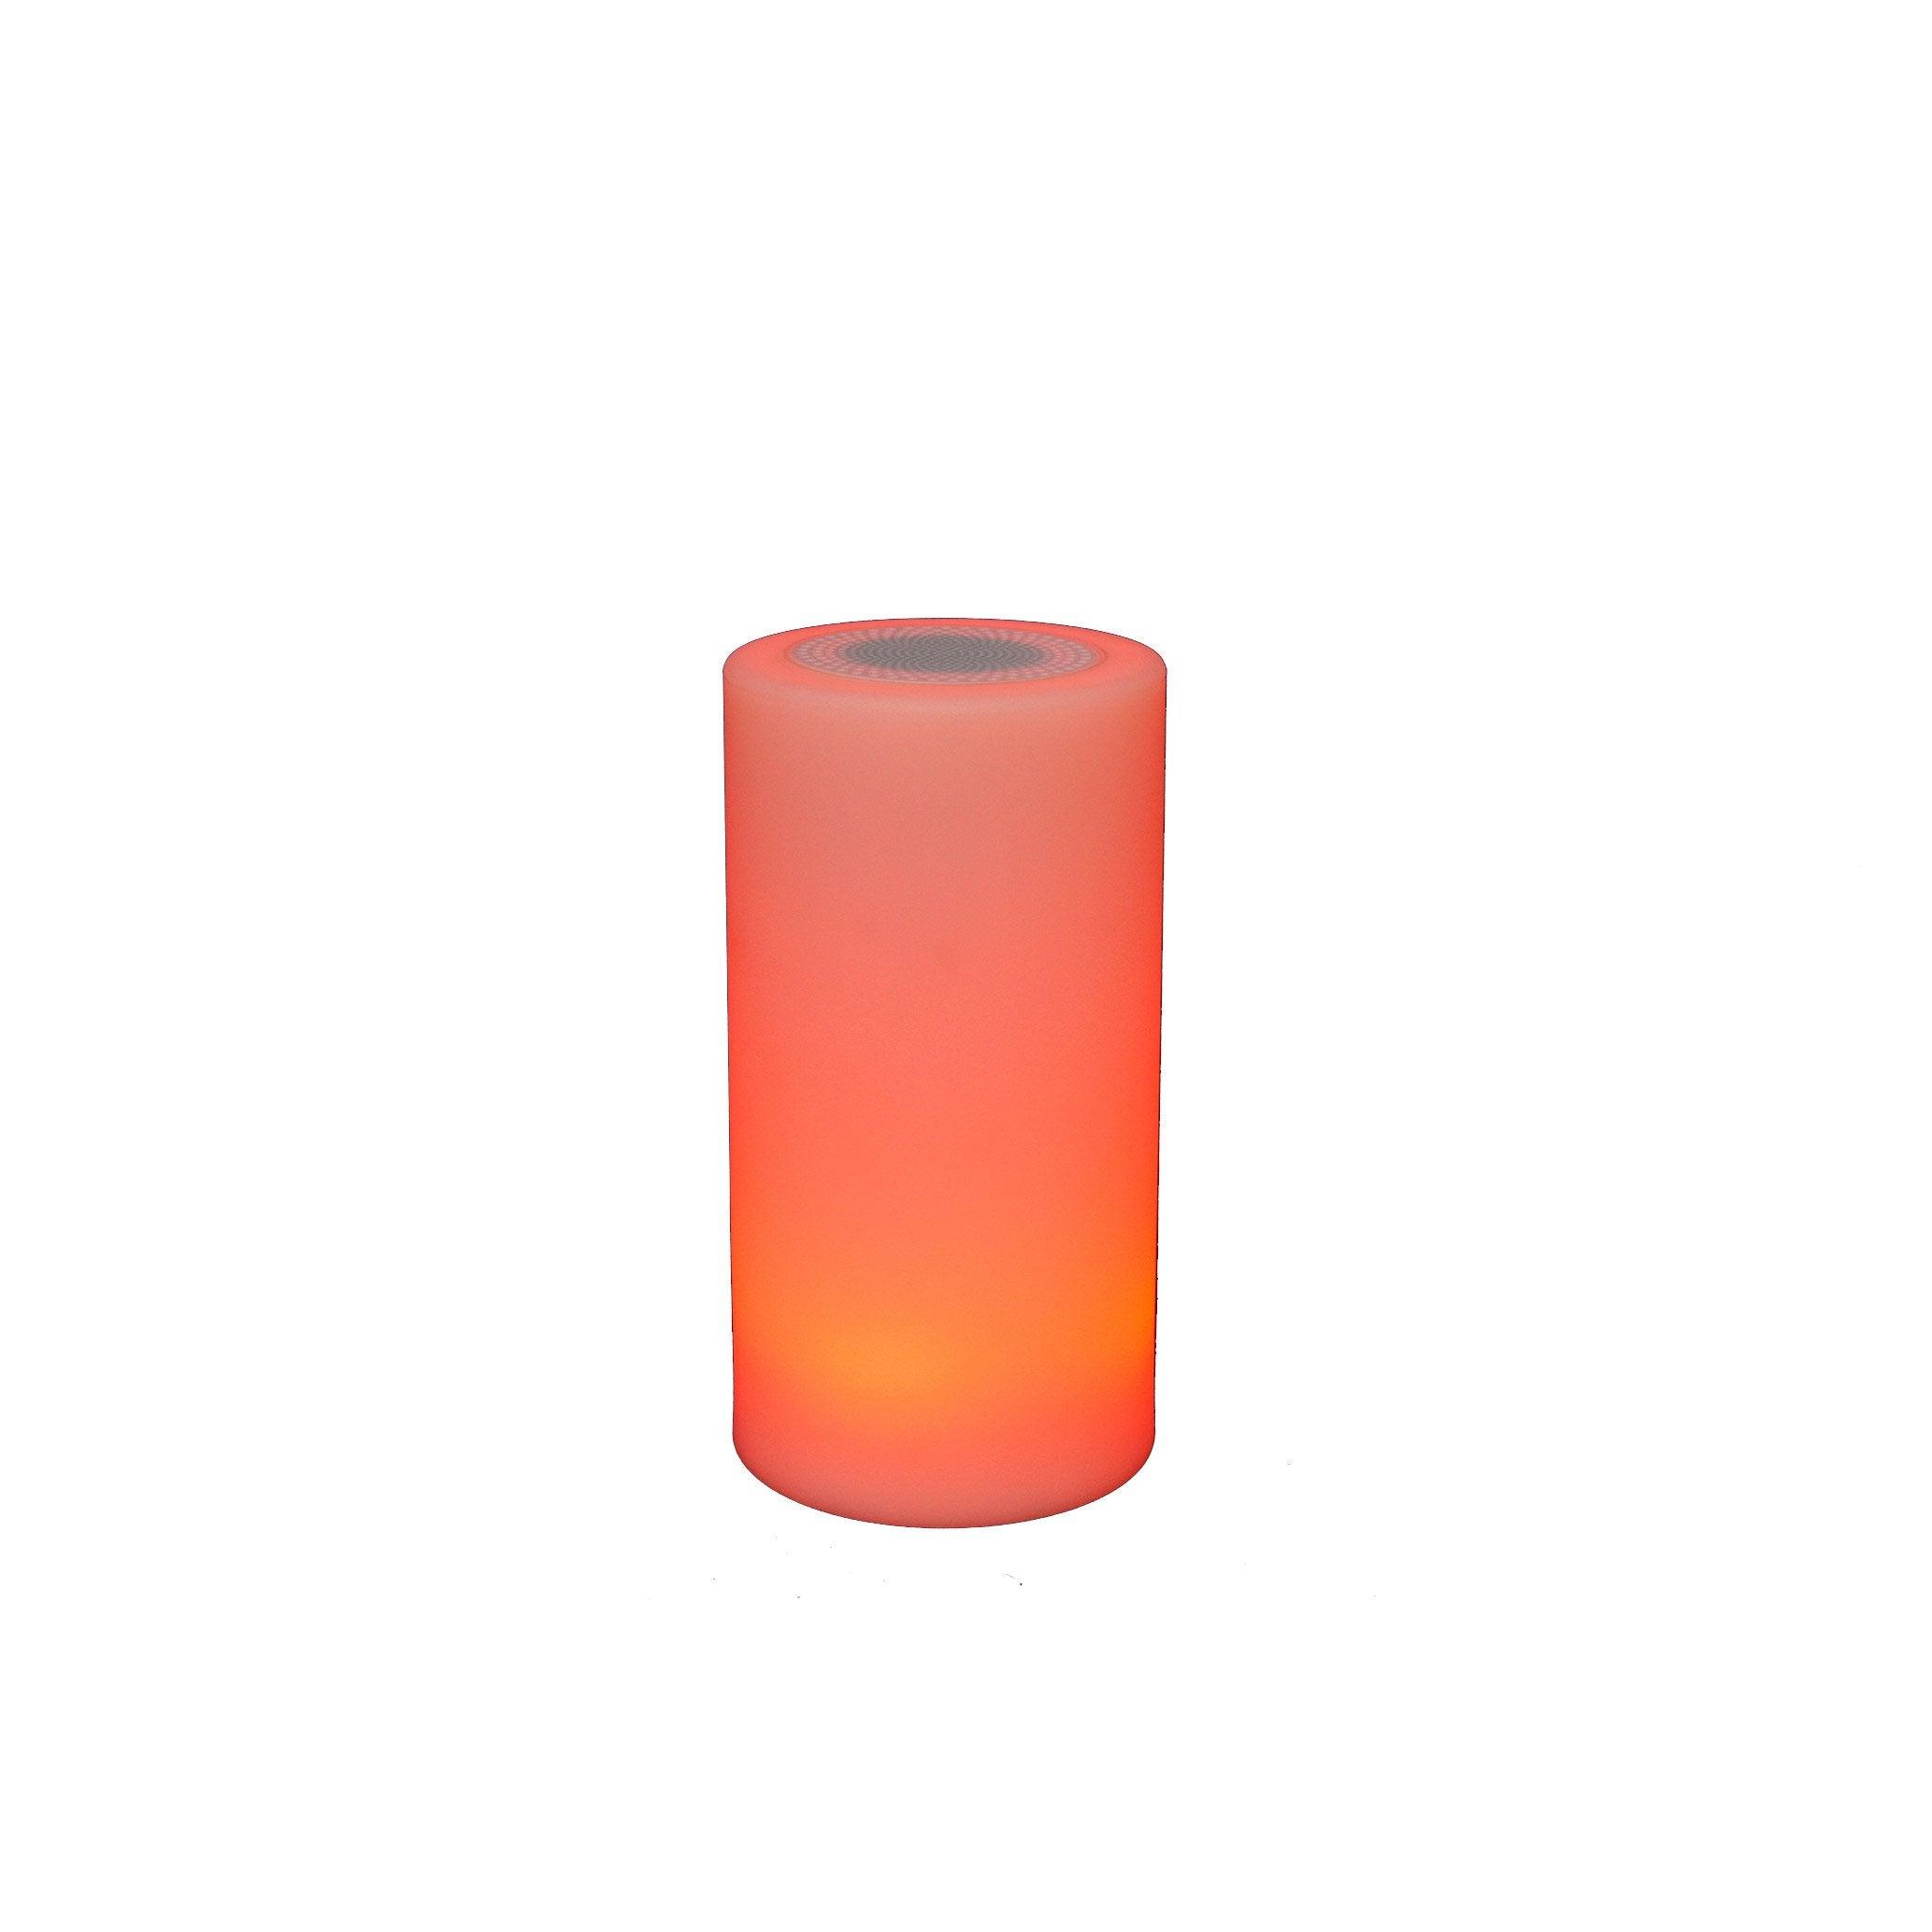 Blanc Sound Varangue Led Lumineux Cylindre Lampe Intégrée H23cm Nomade SpLMqUzVG